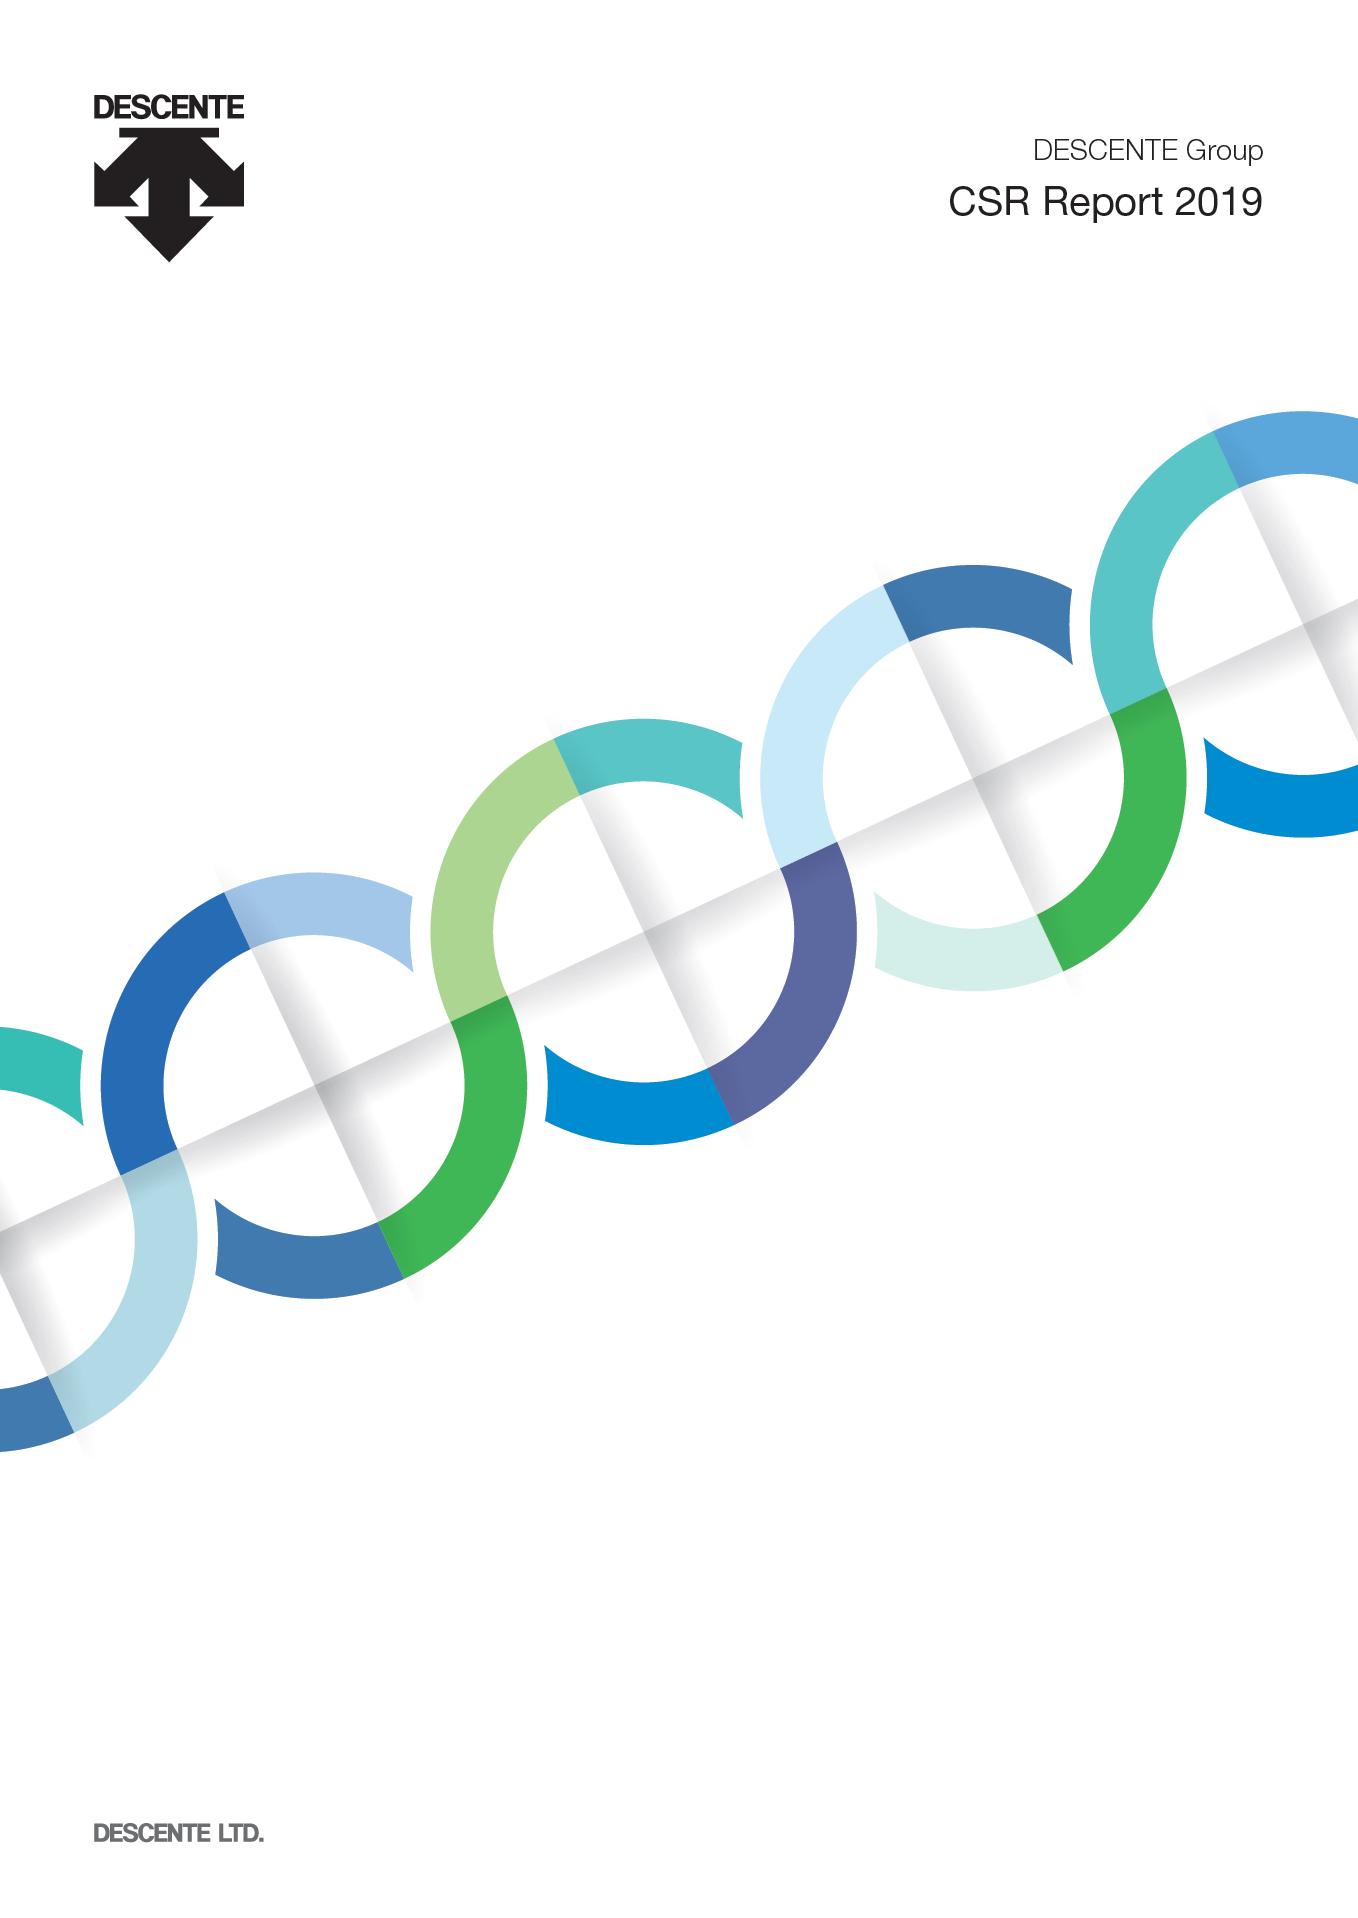 DESCENTE Group CSR Report 2019(English)